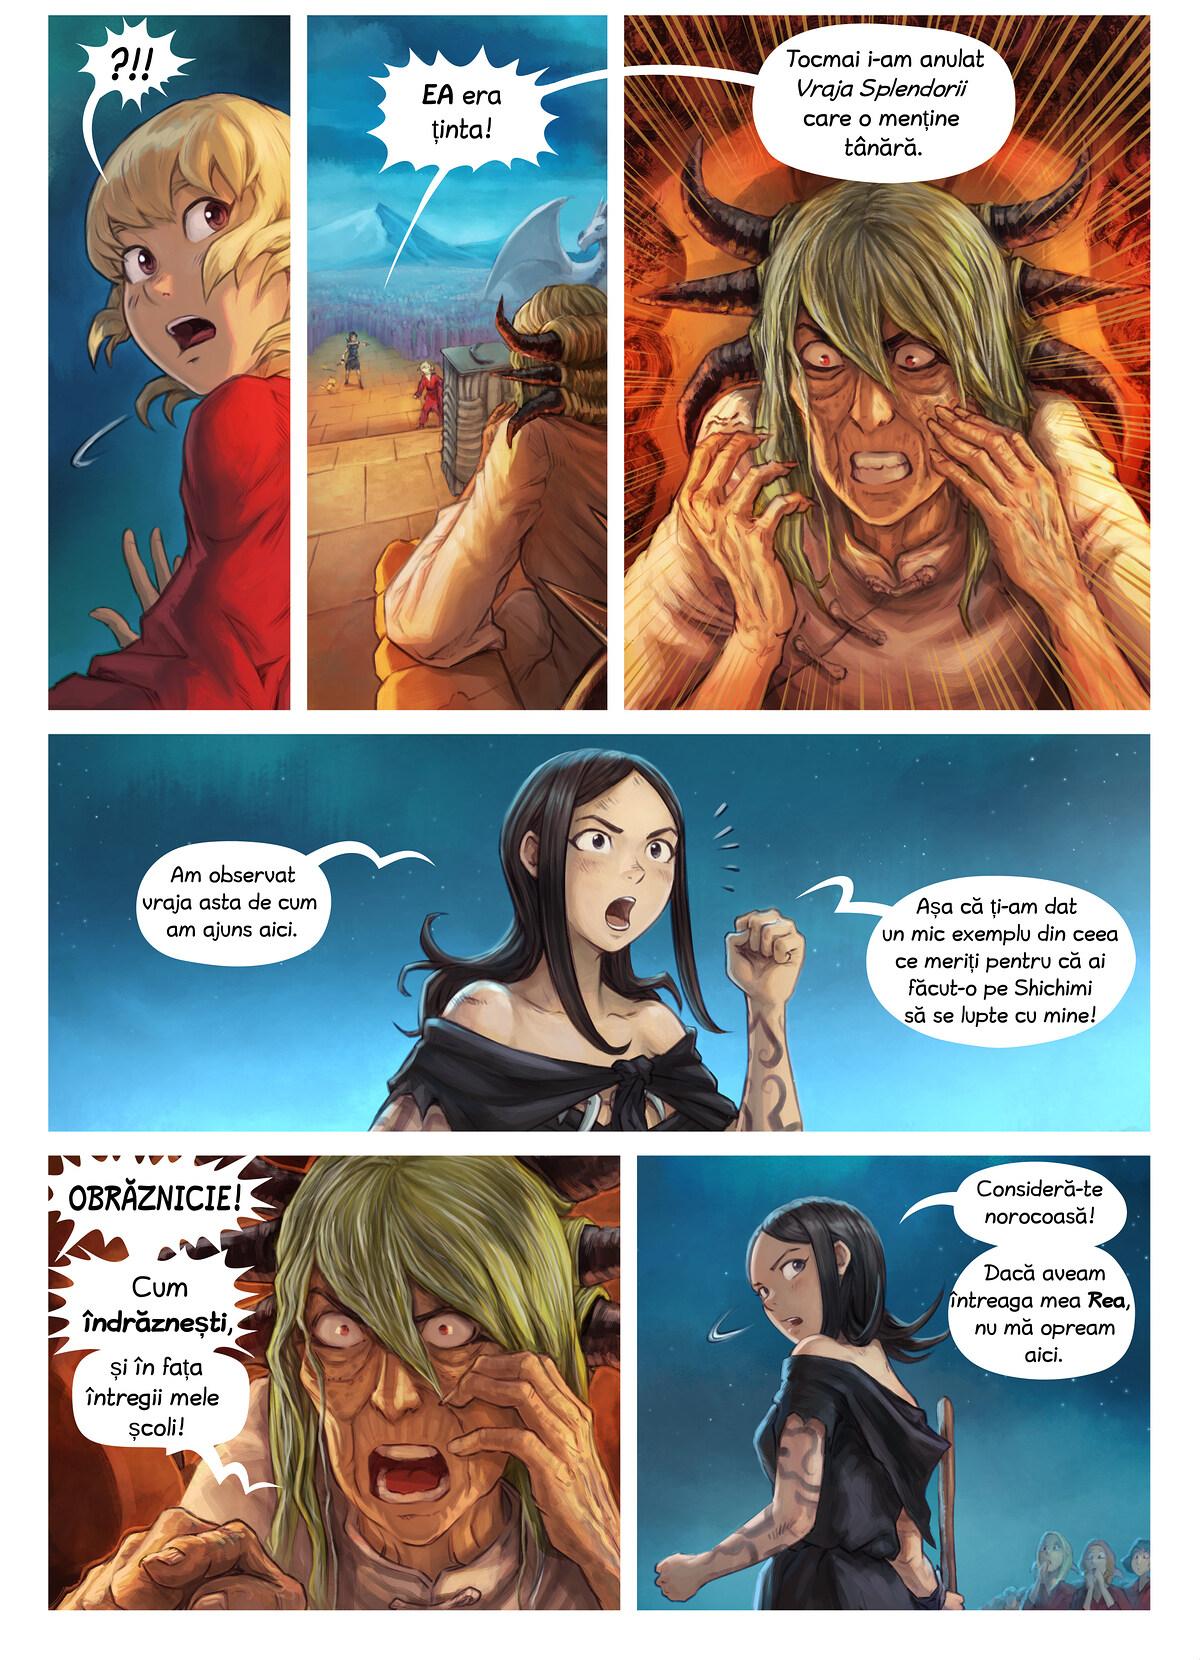 Episodul 34: Cavalerul Shichimi, Page 8